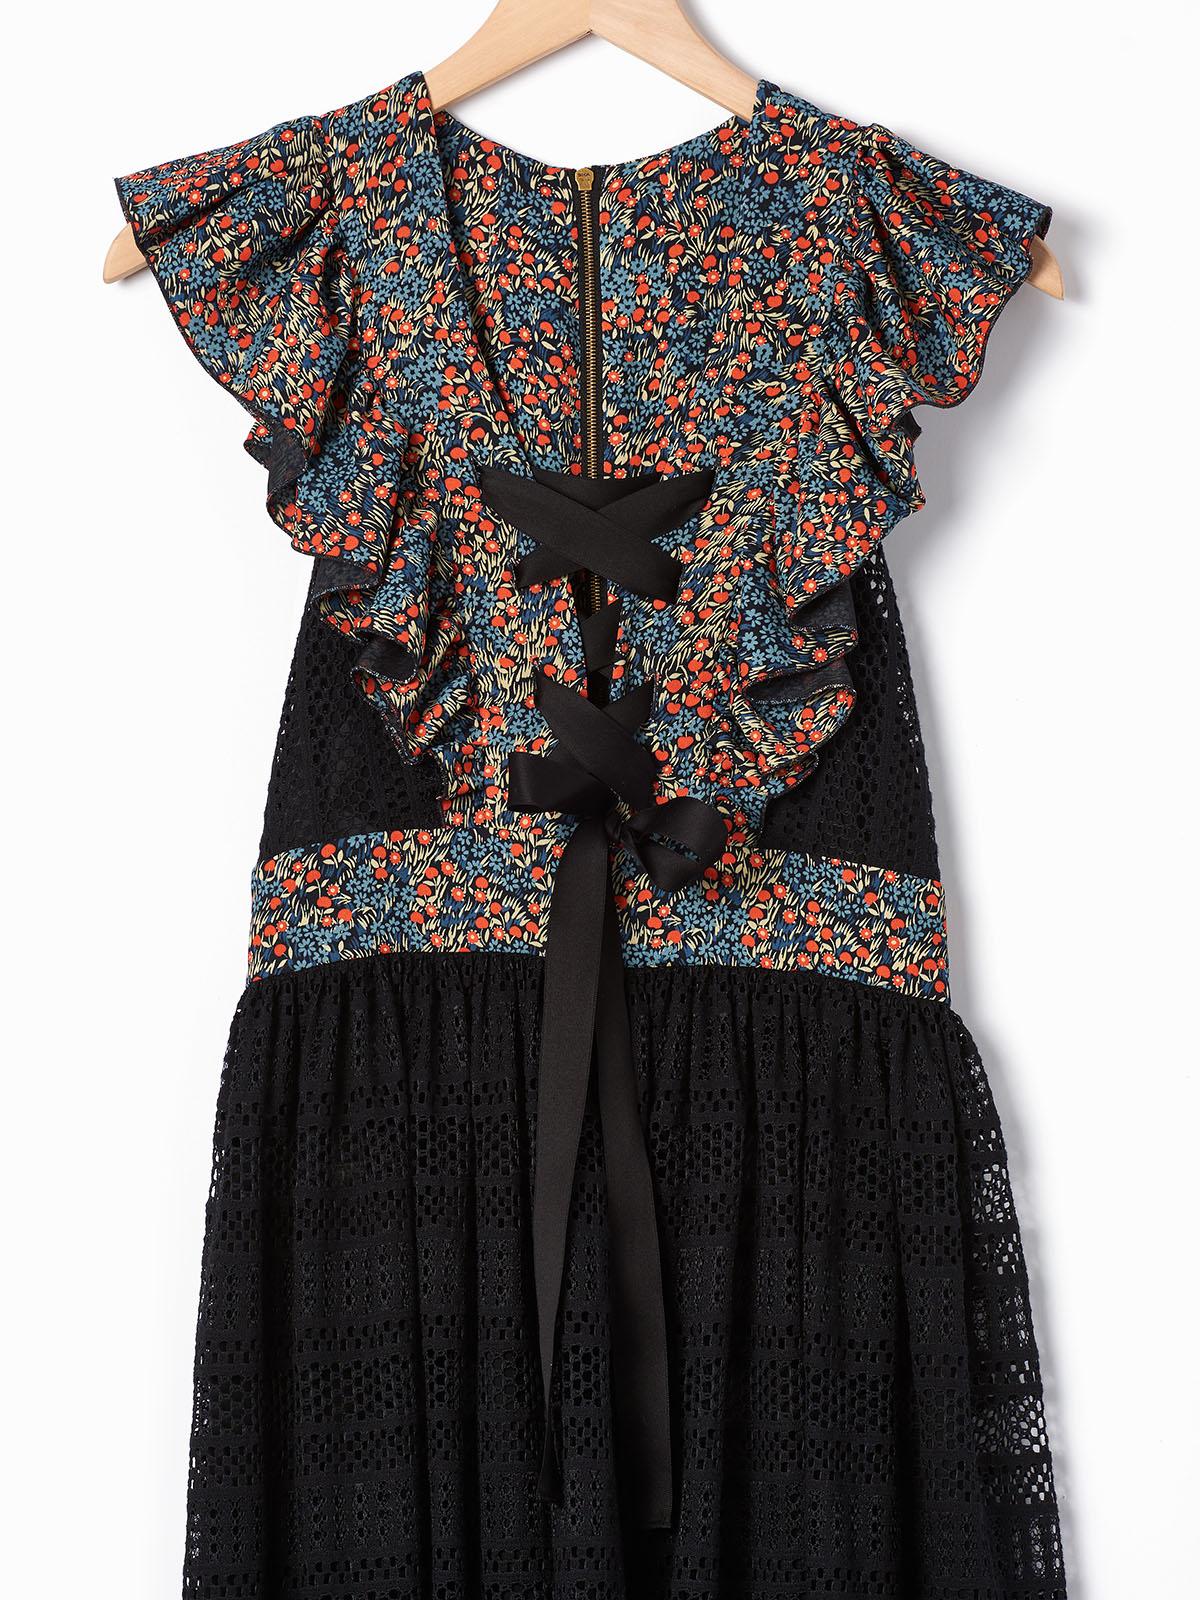 French_Italian_Philosophy_Lorenzo_Serafini_Lace_Cotton_Lace_Up_Dress_03.jpg